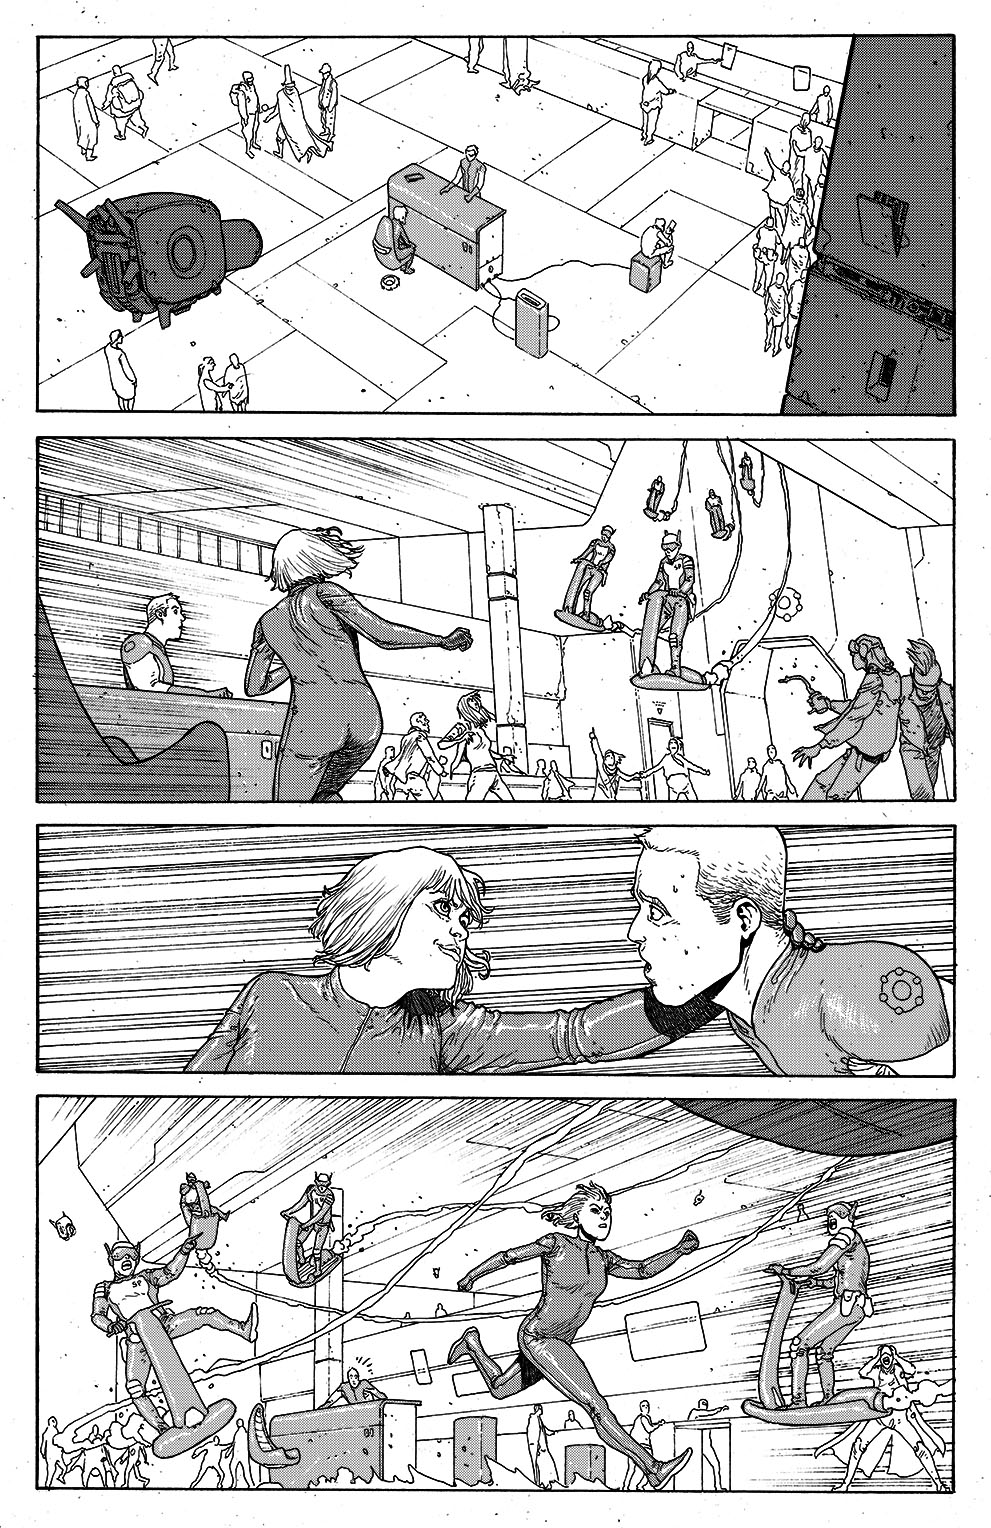 LegionALA_page29.jpeg